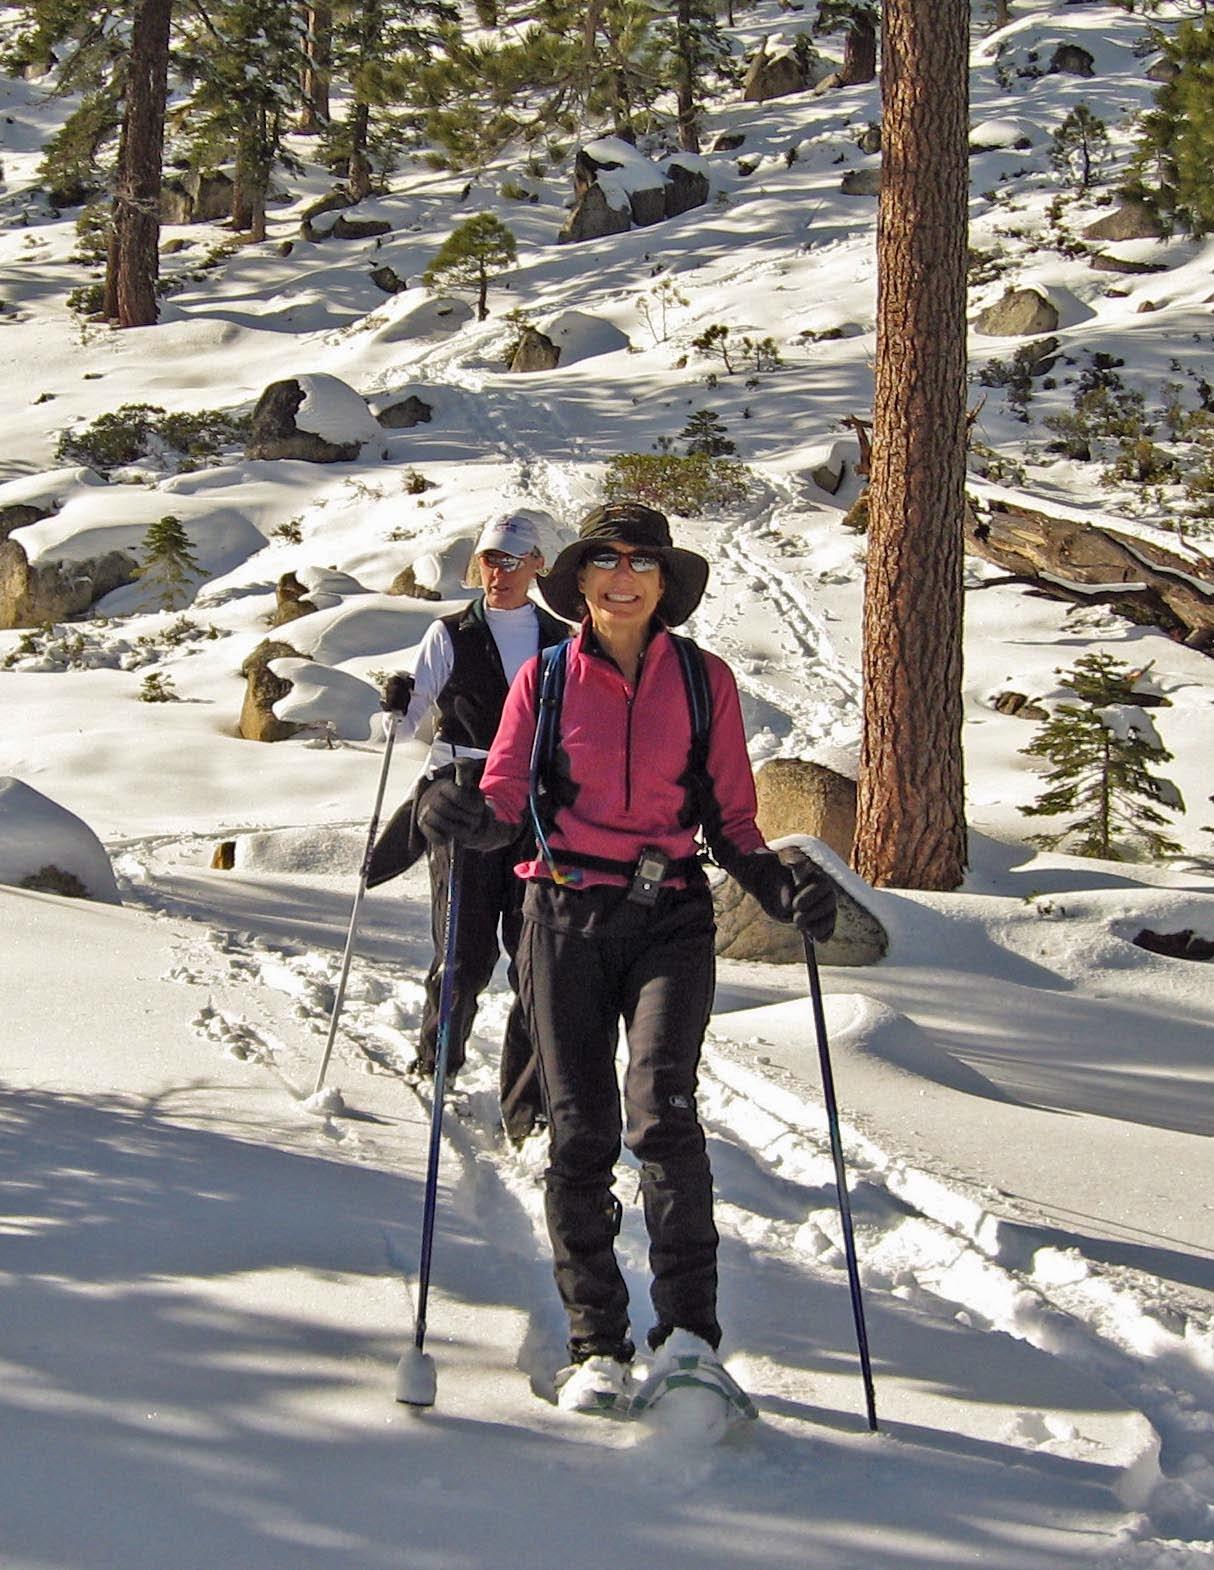 Alpenglow Mountain Festival celebrates Tahoe winter sports